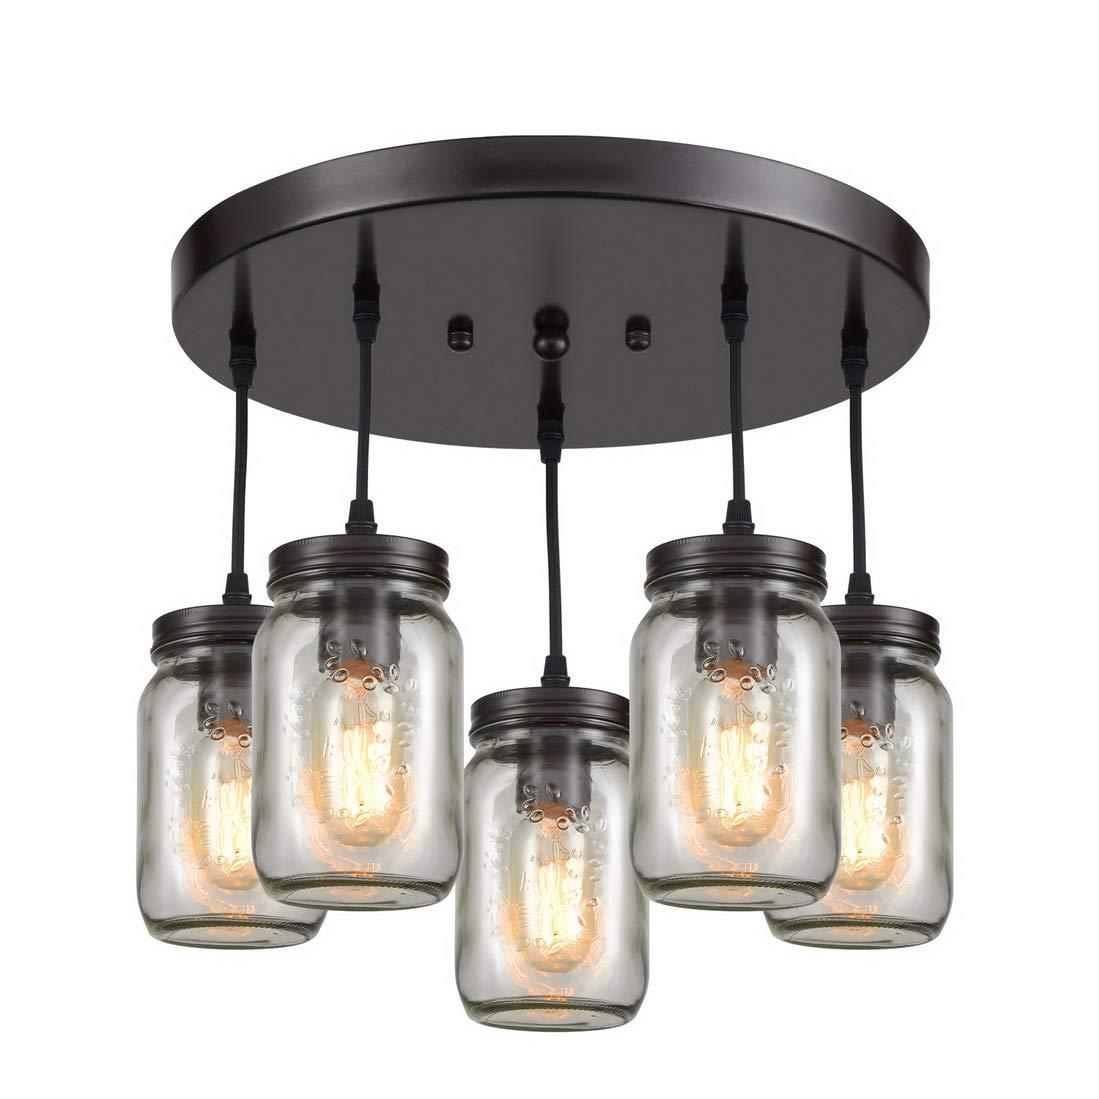 EUL Rustic Mason Jar Semi Flush Mount Ceiling Light 5-Light Pendant Lighting Fixture Oil Rubbed Bronze